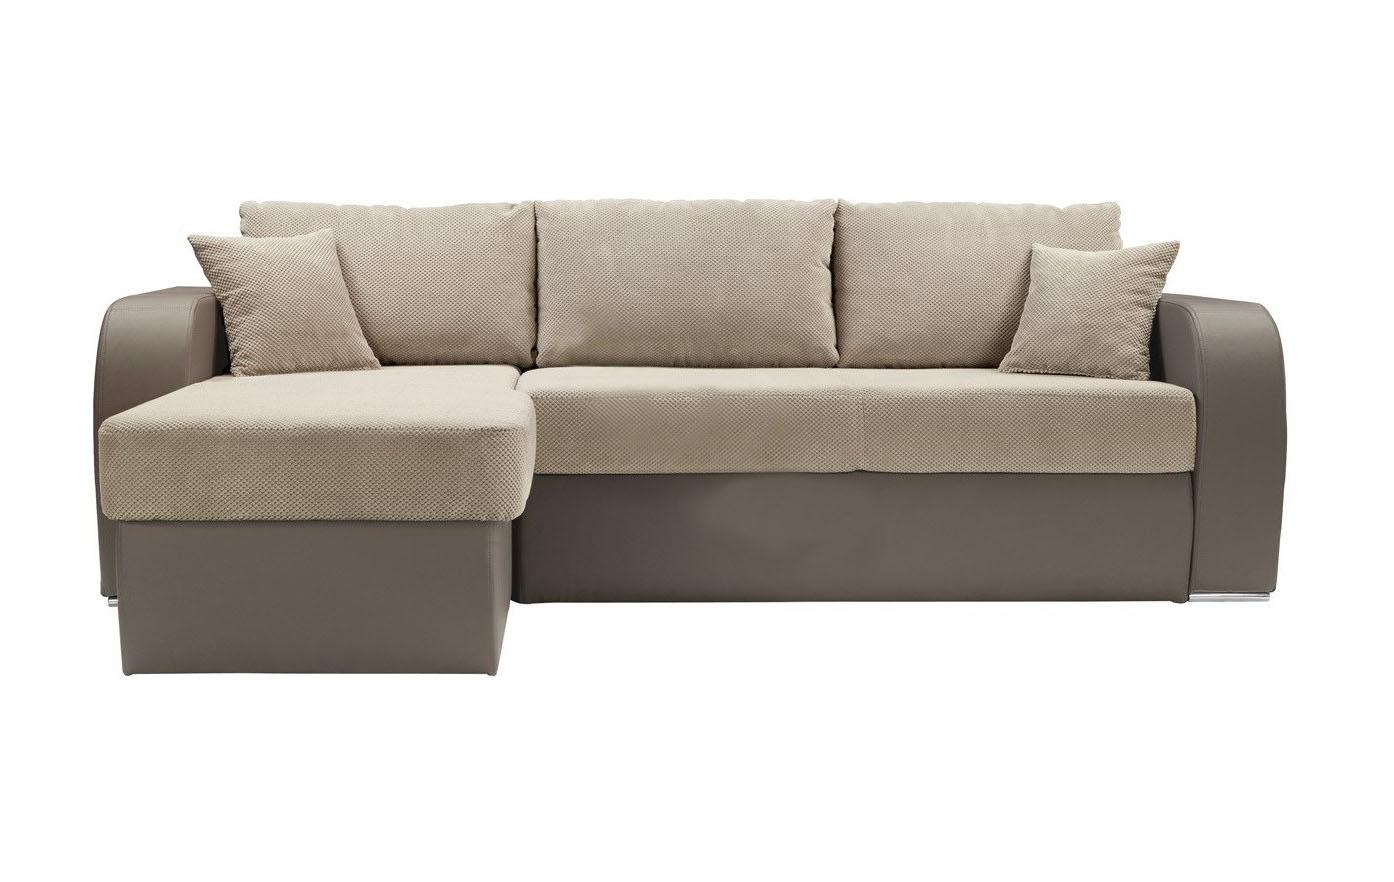 Угловой диван Кармен-4